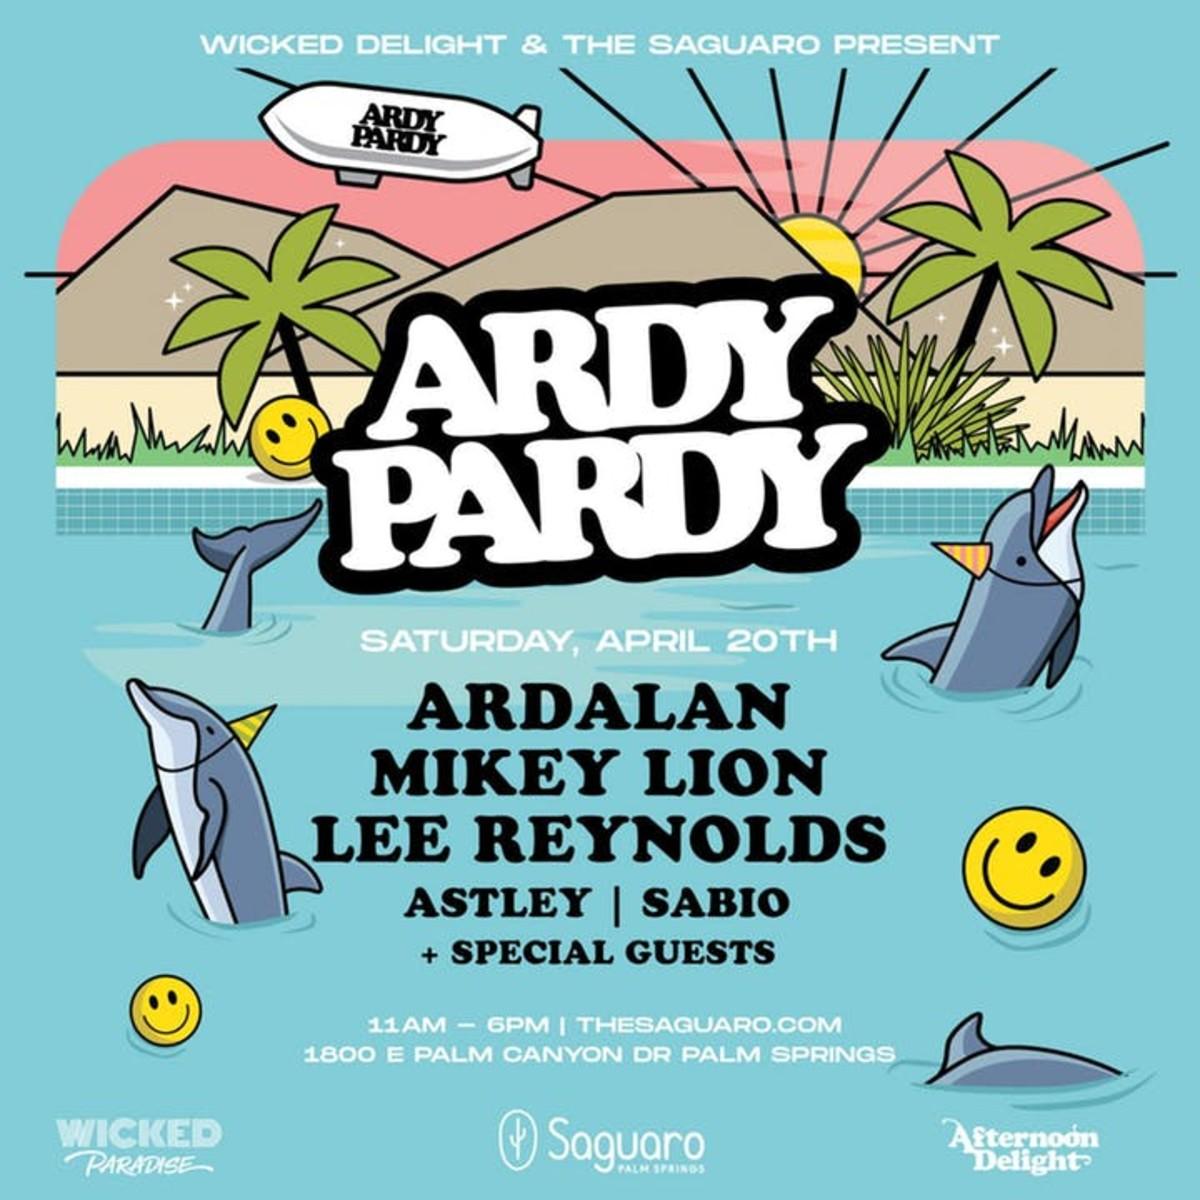 ardy-party-coachella-saguaro-desert-hearts